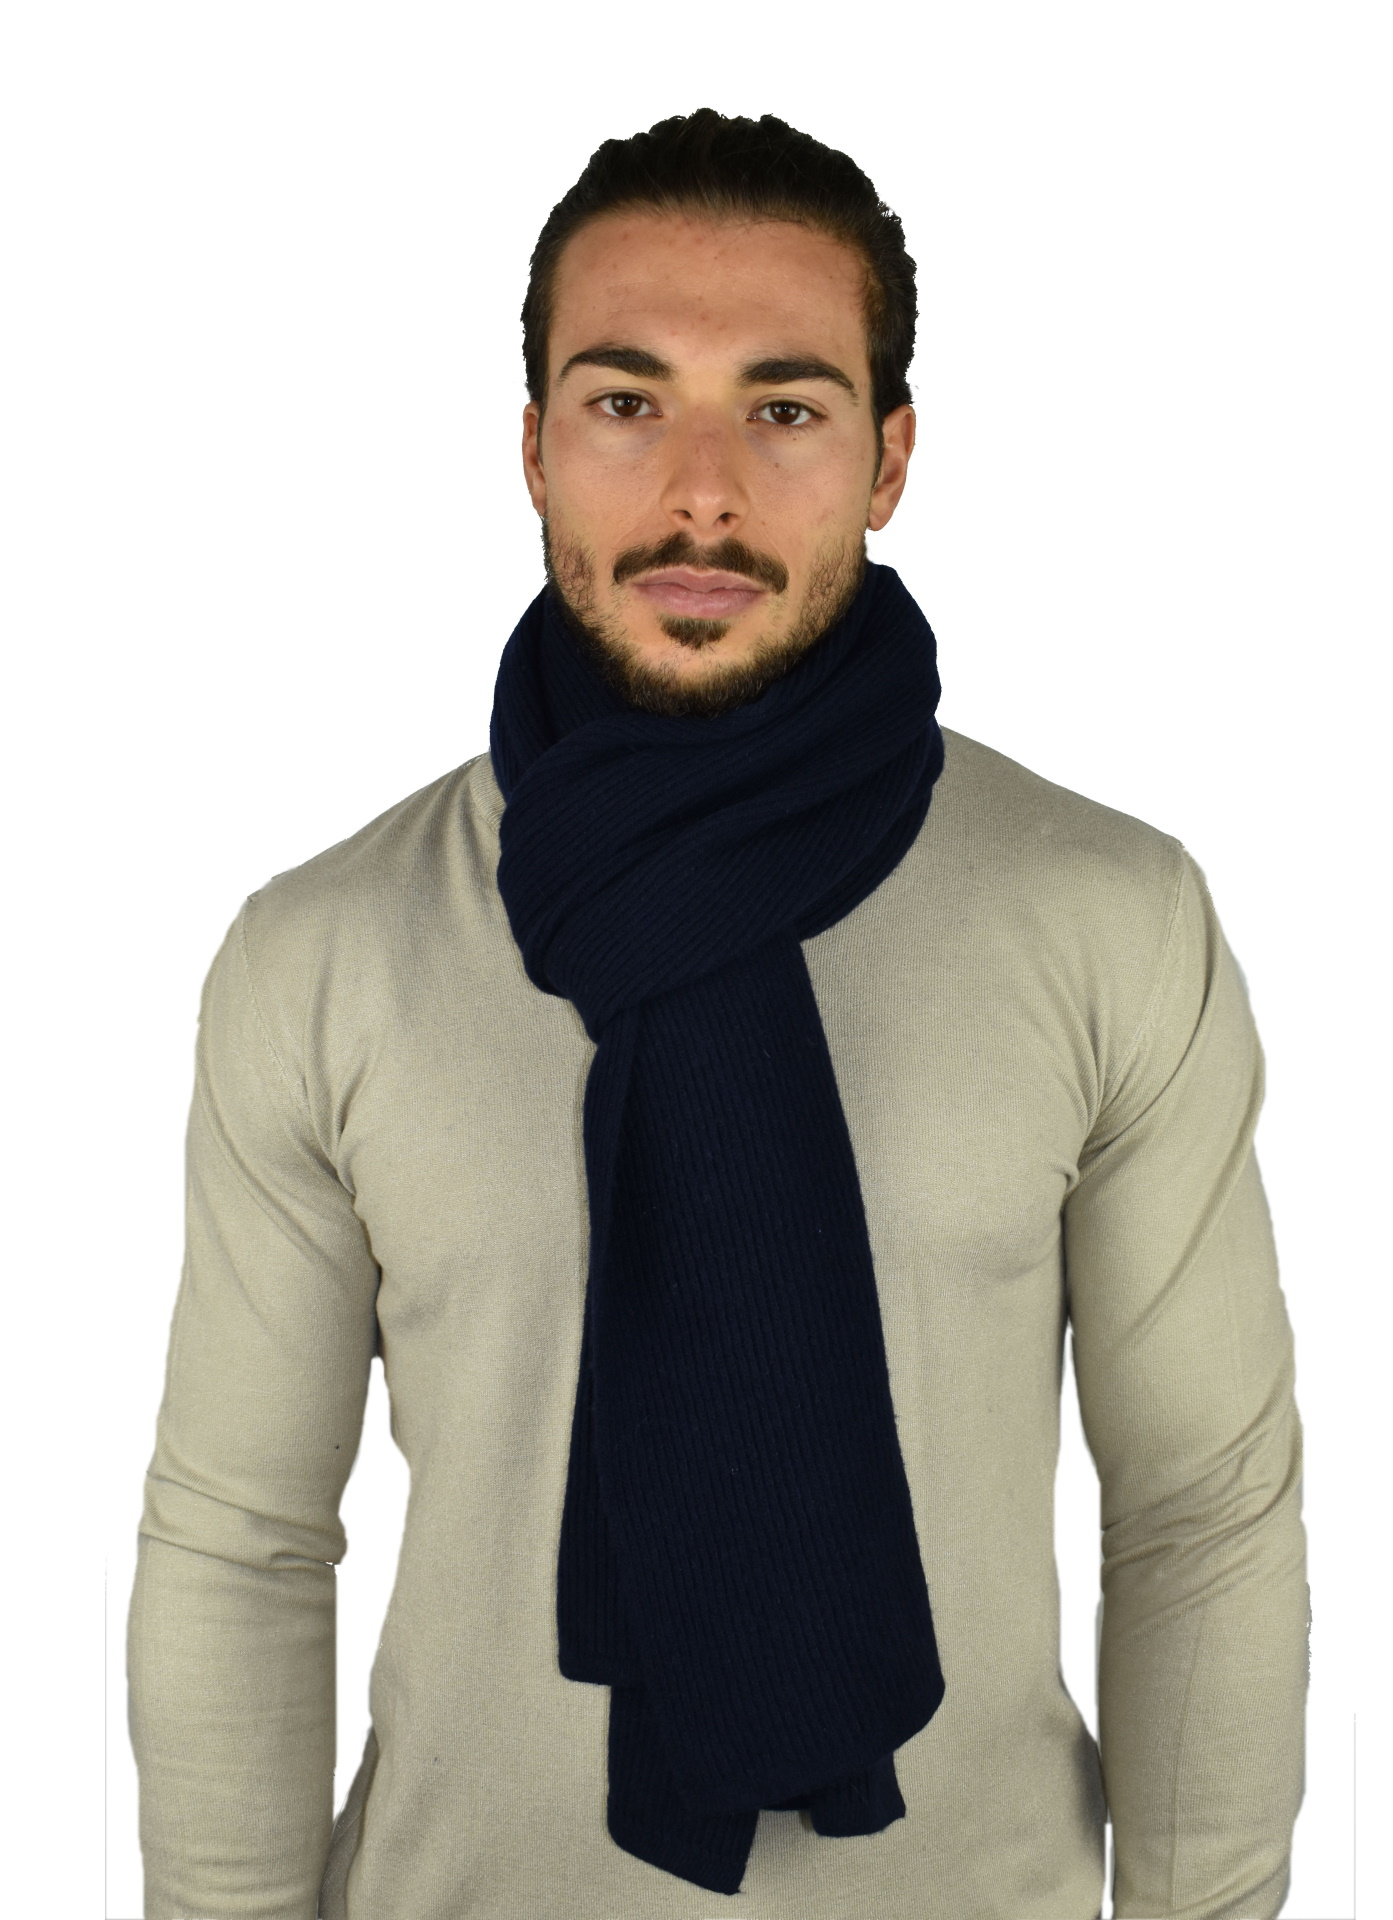 JURIDARIO NAVY SCIARPA UOMO 100 PURO CASHMERE COSTE LARGHE 1 1stAmerican sciarpa da uomo 100% puro cashmere Made in Italy a coste larghe - calda sciarpa invernale